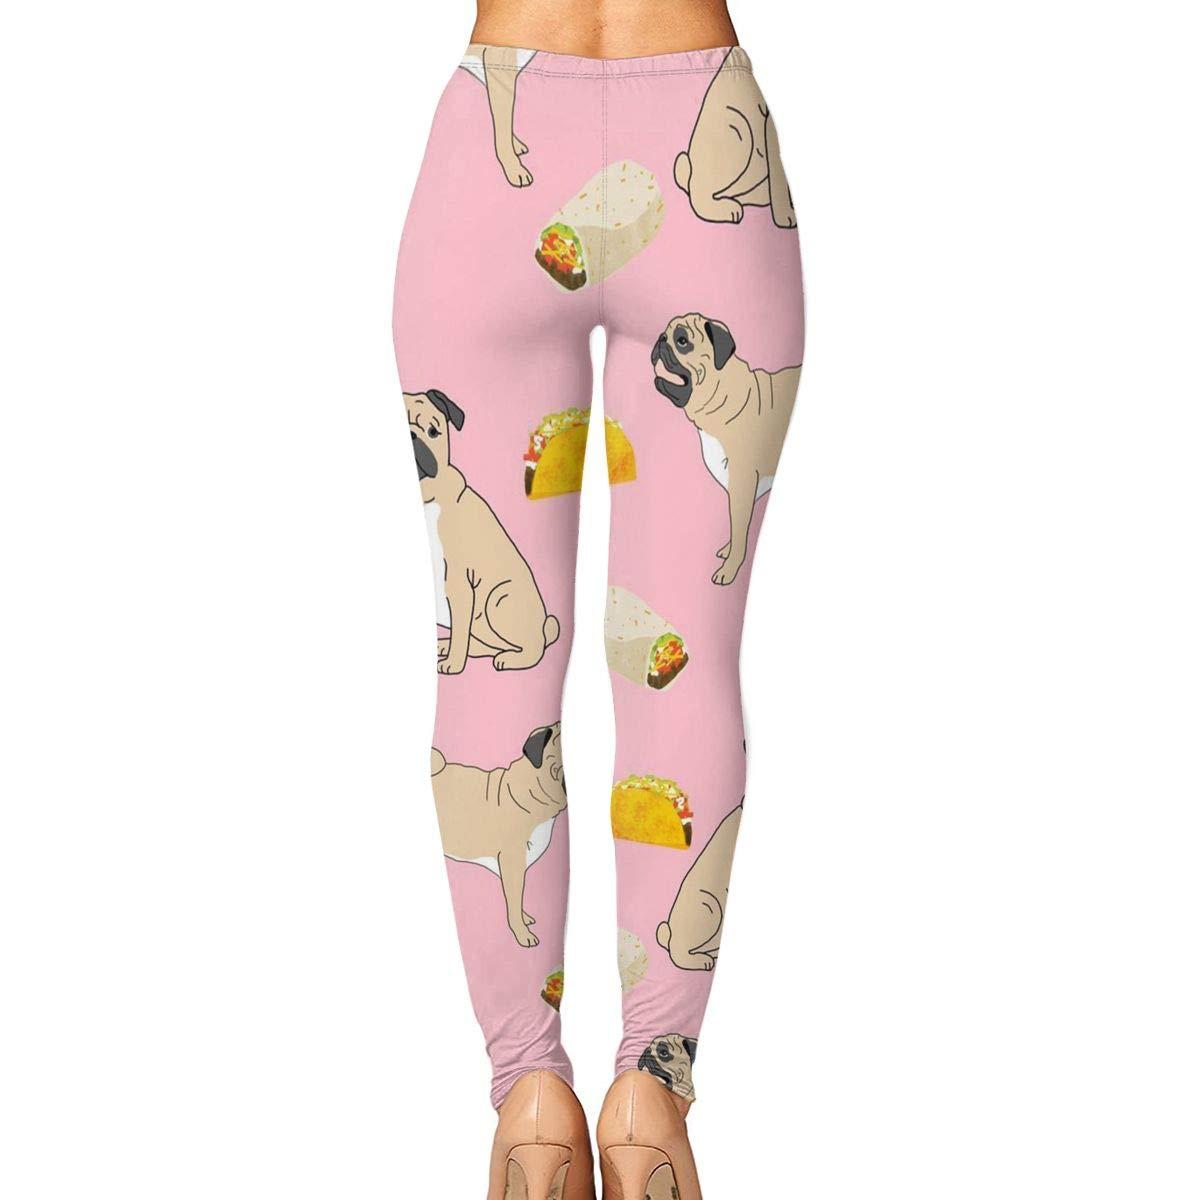 Amazon.com : Xayeu Pugs Dog Tacos Food Yoga Pants for Women ...